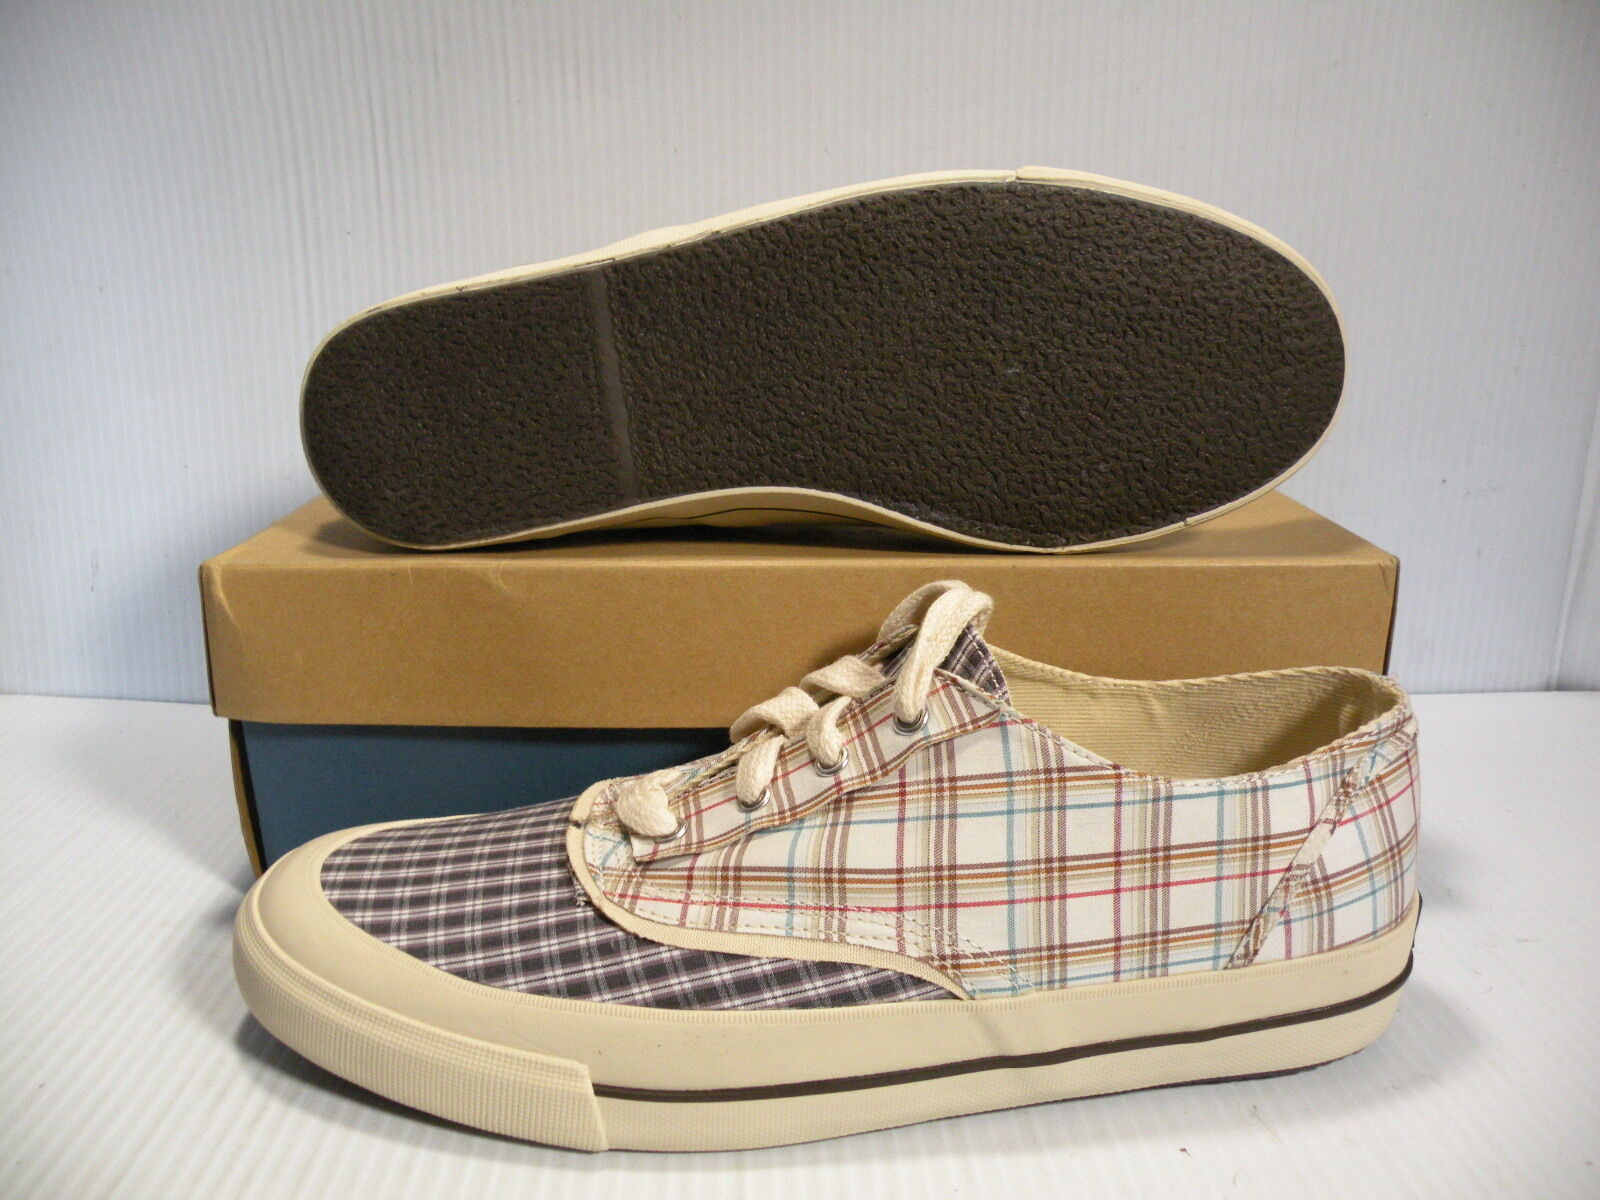 quality design cb0ef 3c96c KEDS TRIUMPH CVO NATURAL MEN SHOES WHITE BLACK MF18695 12 NEW SIZE PLAID  ntronr2683-new shoes